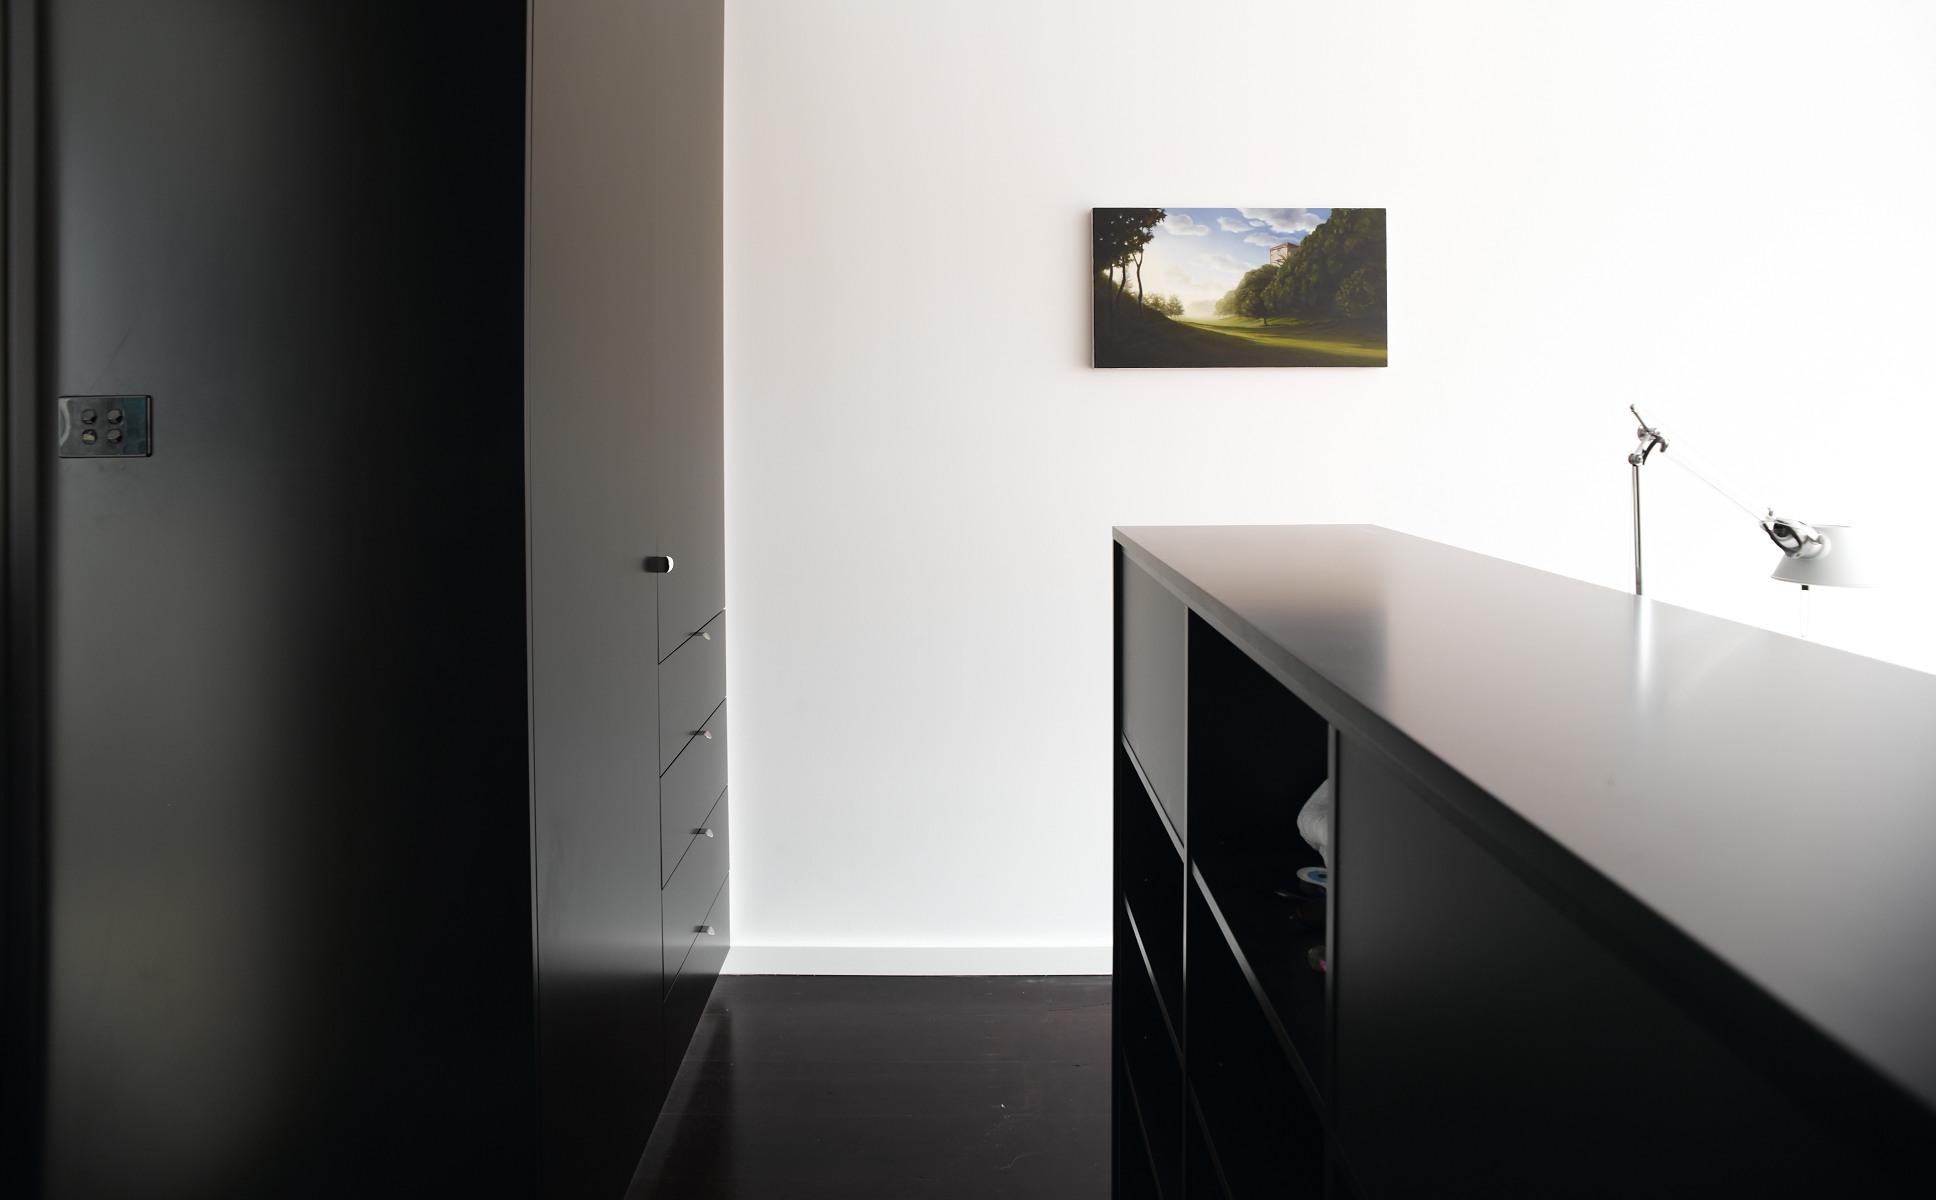 interiors 0278.jpg